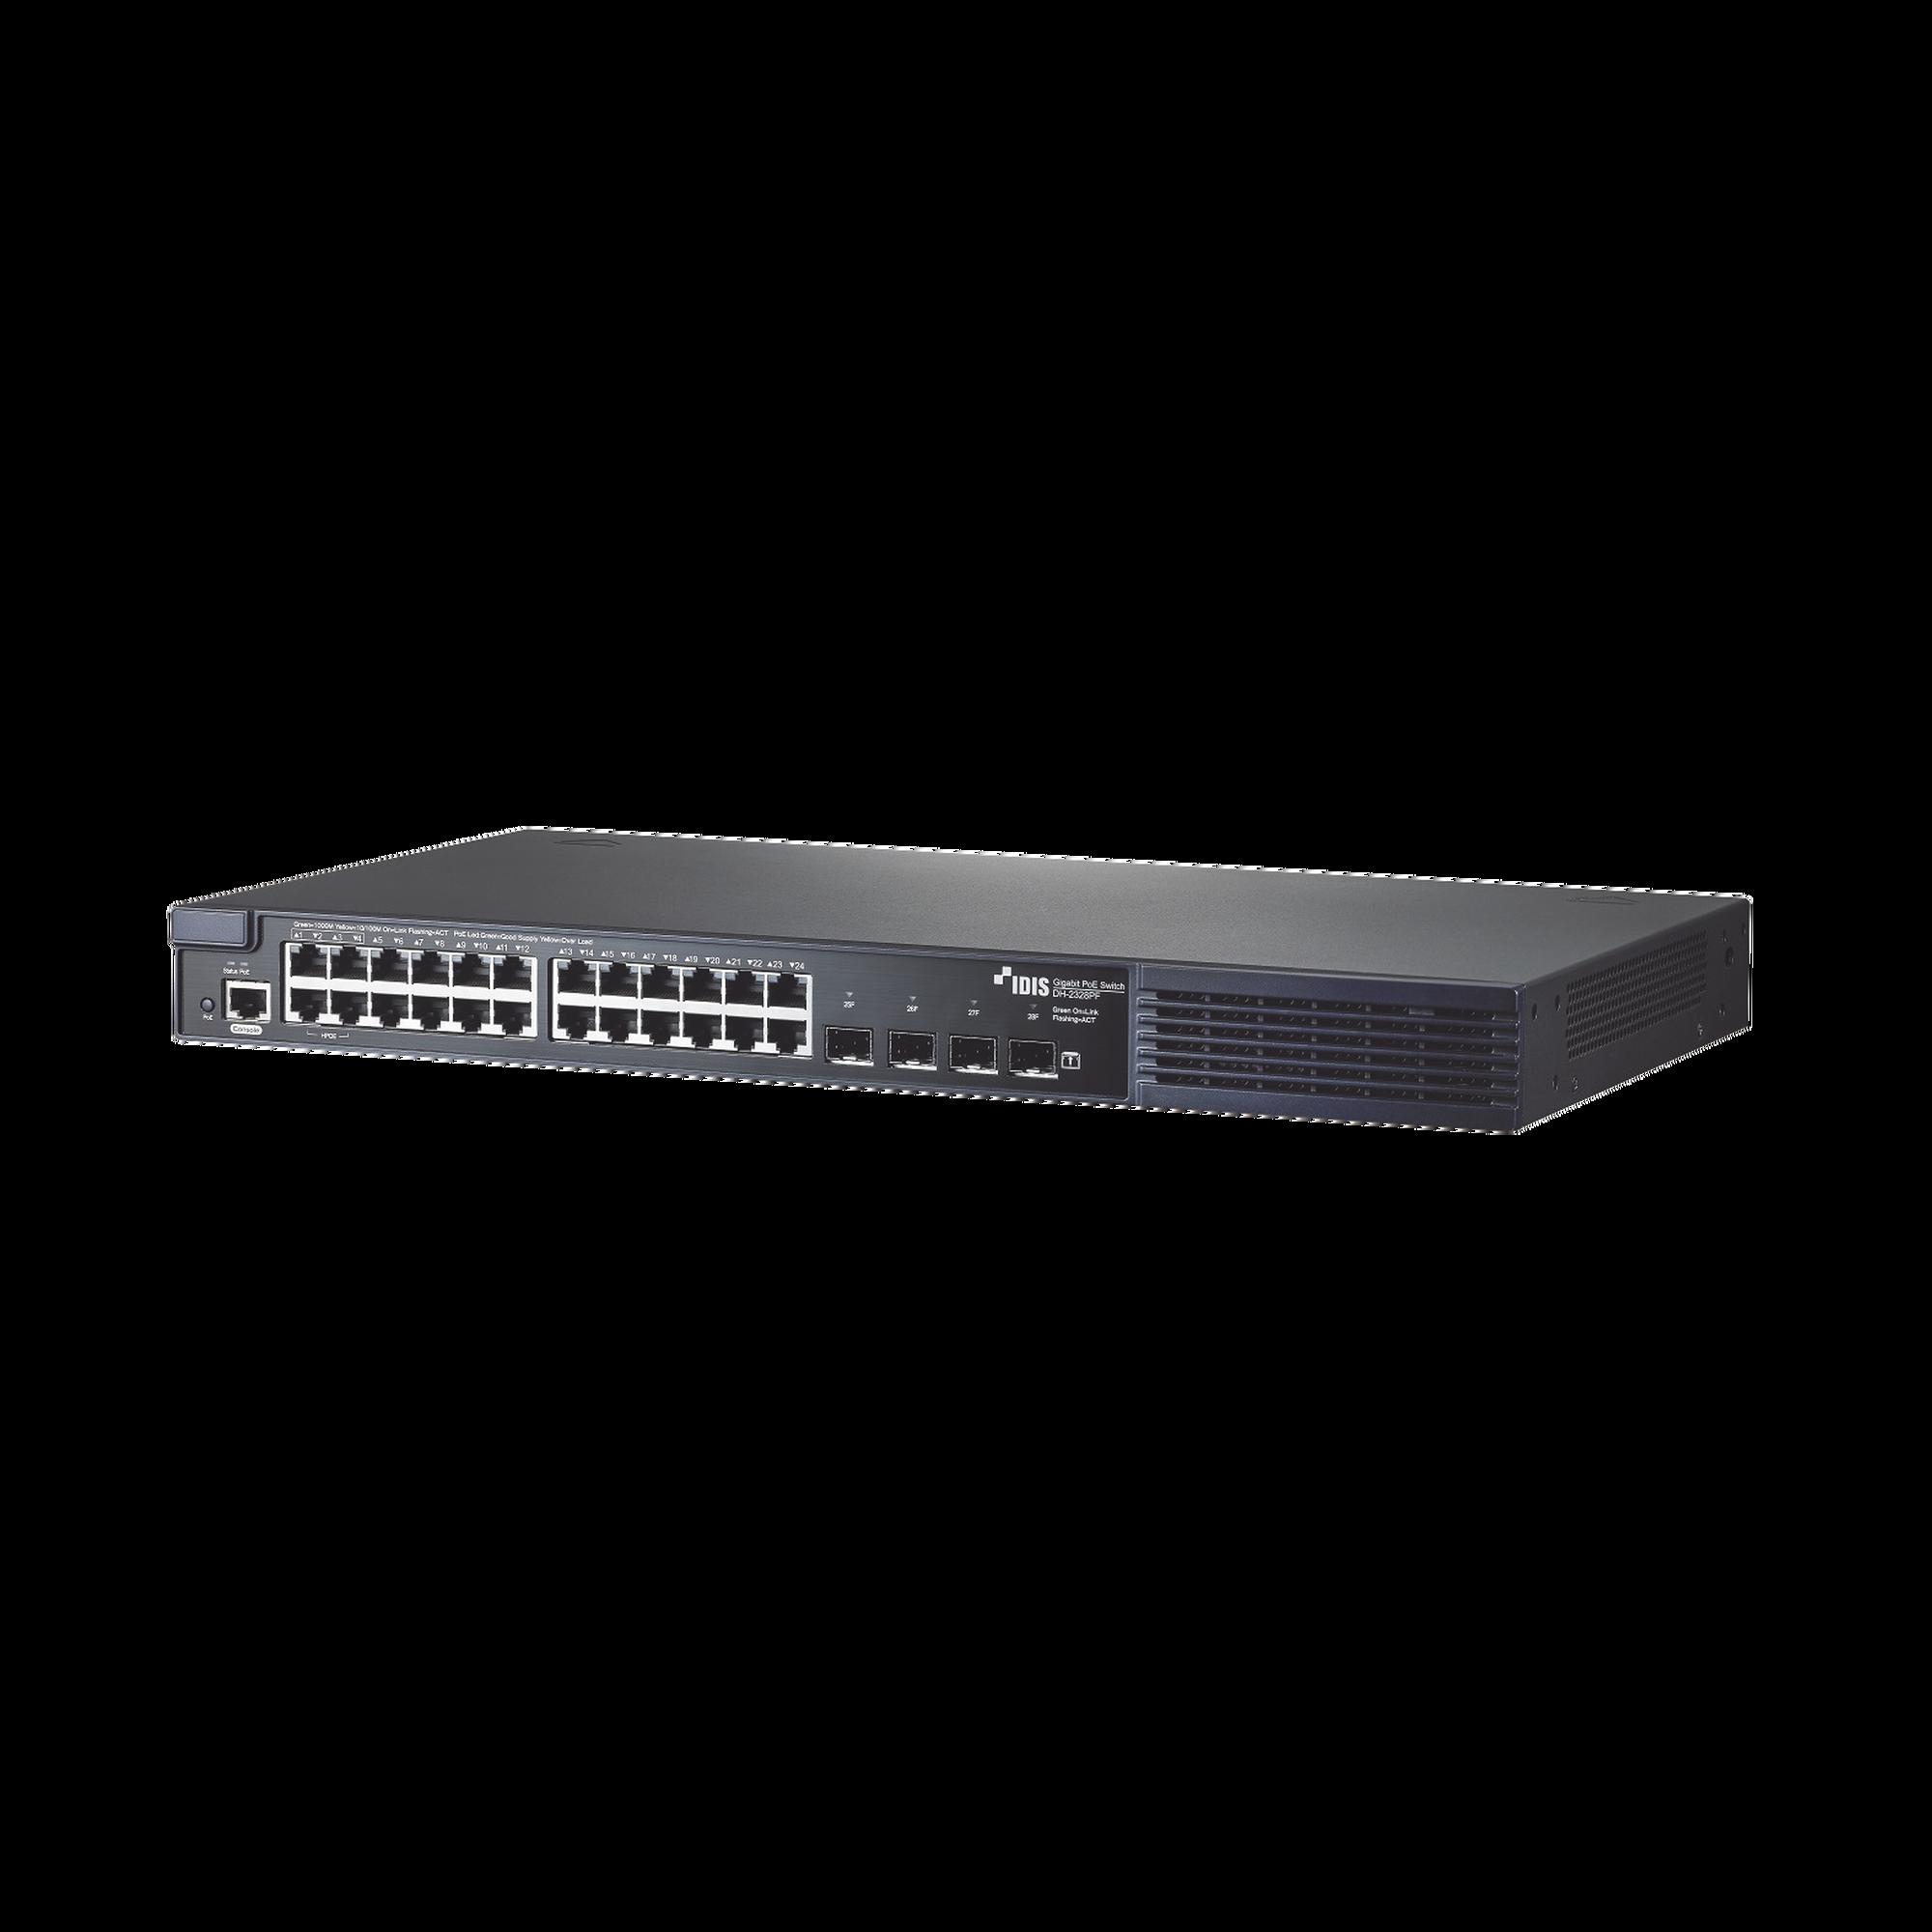 Switch PoE 802.3af/at   DirectIP Gigabit   24 puertos RJ45   4 Puertos Fibra optica   380W PoE